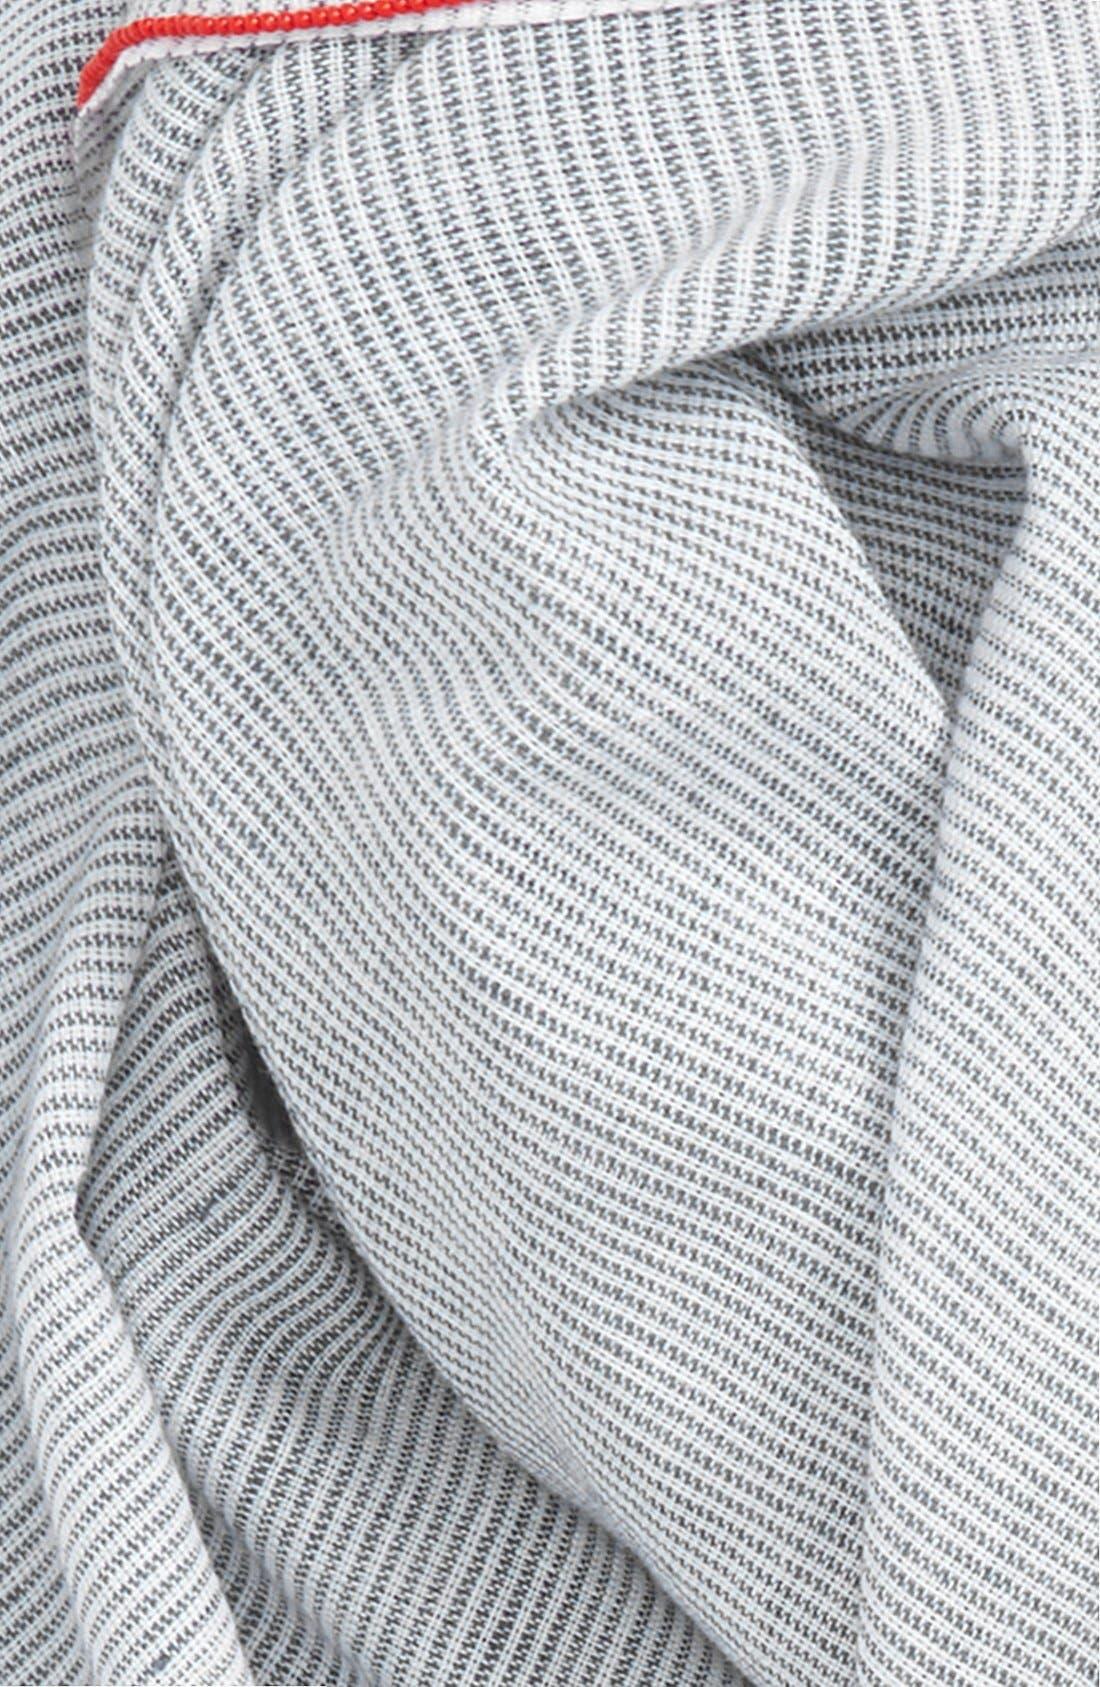 Alternate Image 3  - Steve Madden Microstripe Wrap Scarf